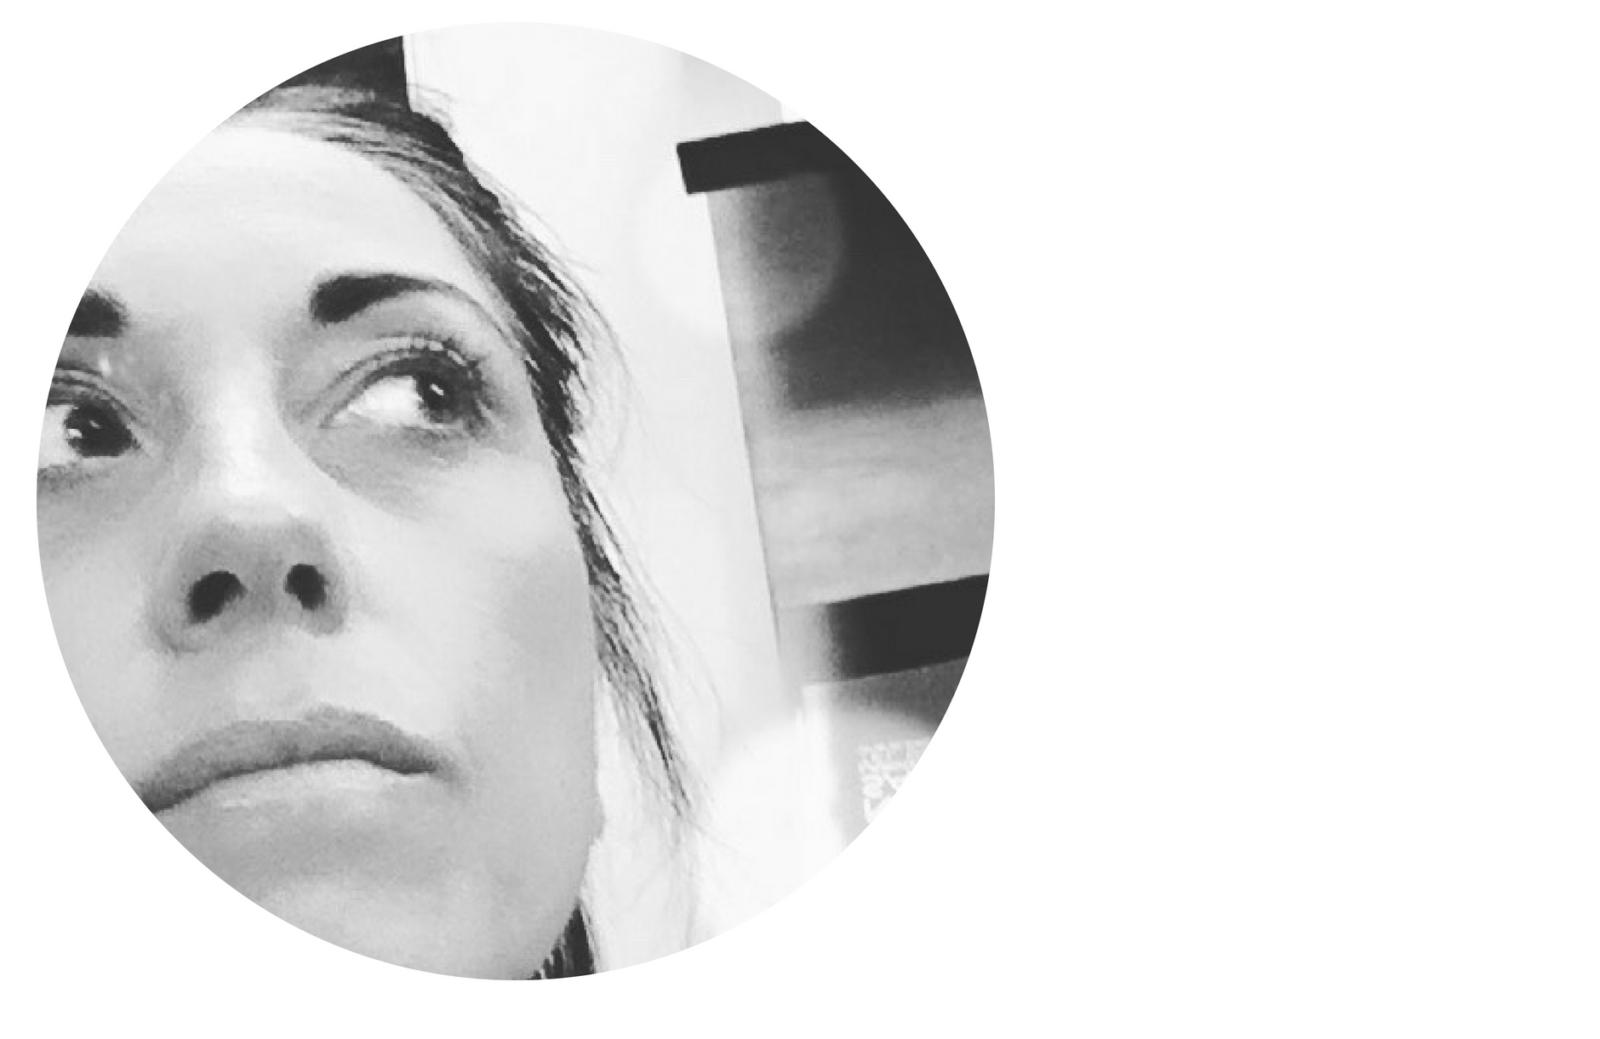 psicologo terracina ansia panico depressione disturbi alimentari latina